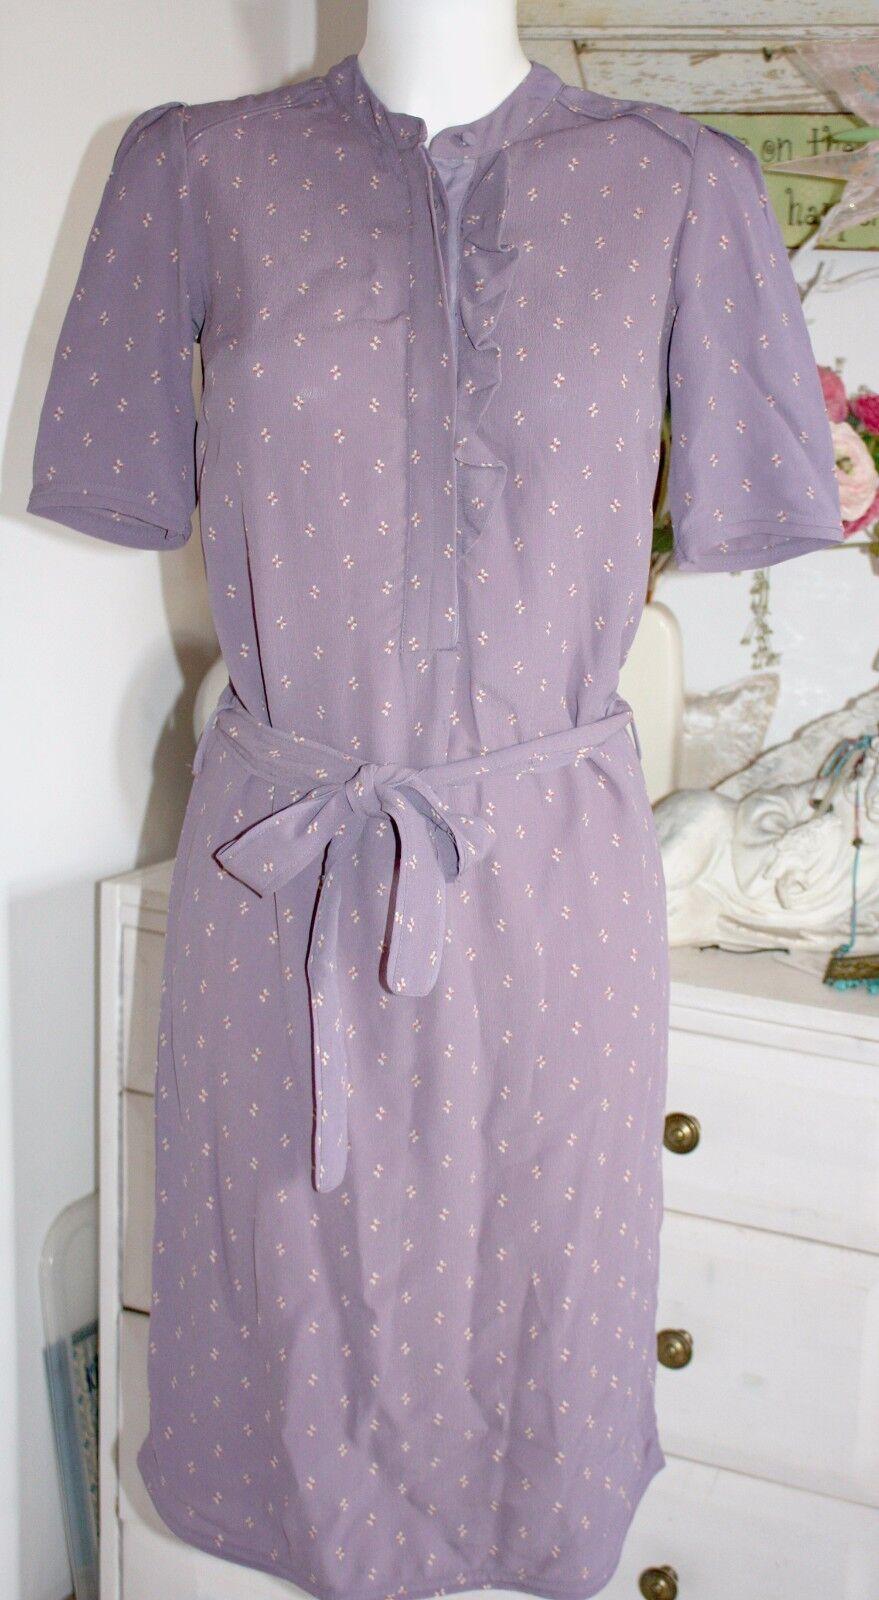 Noa Noa  Kleid  Dress  Kurzarm Fluid Printed  lila   Größe 32  Neu